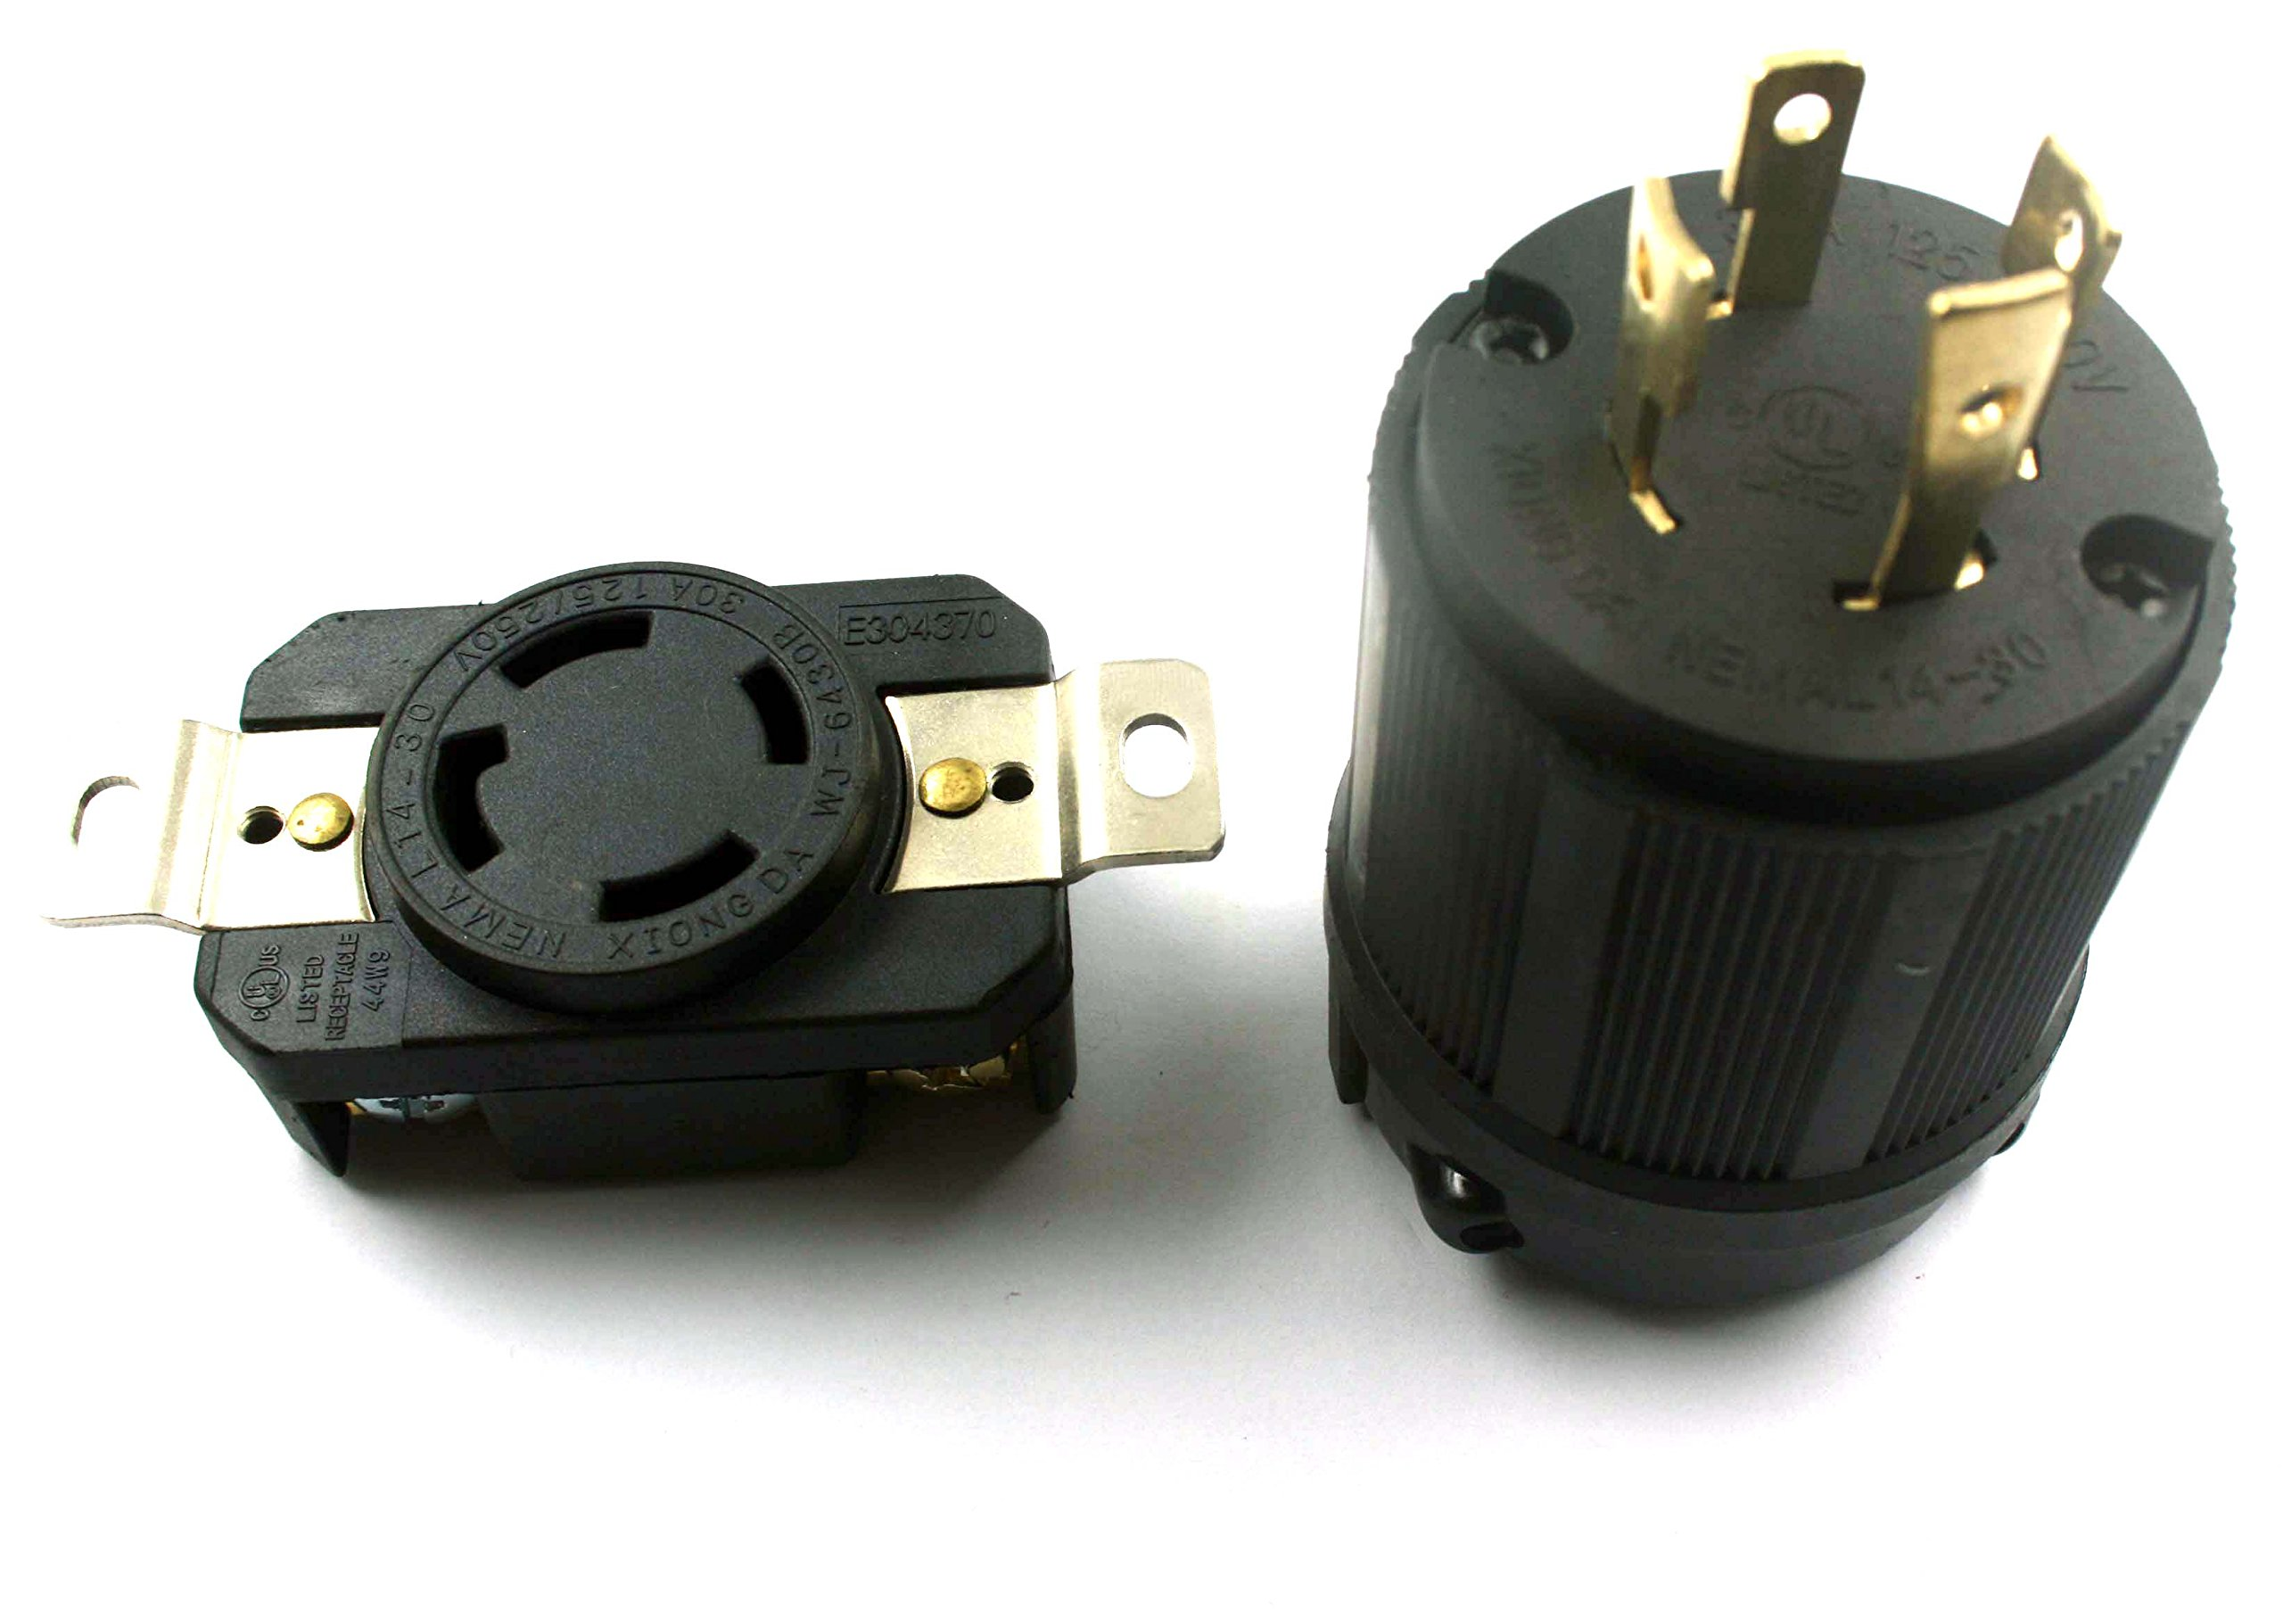 XtremeAmazing GENERATOR RV AC PLUG & SOCKET L14-30 30 AMP 120V 220V MALE & FEMALE RECEPTACLE